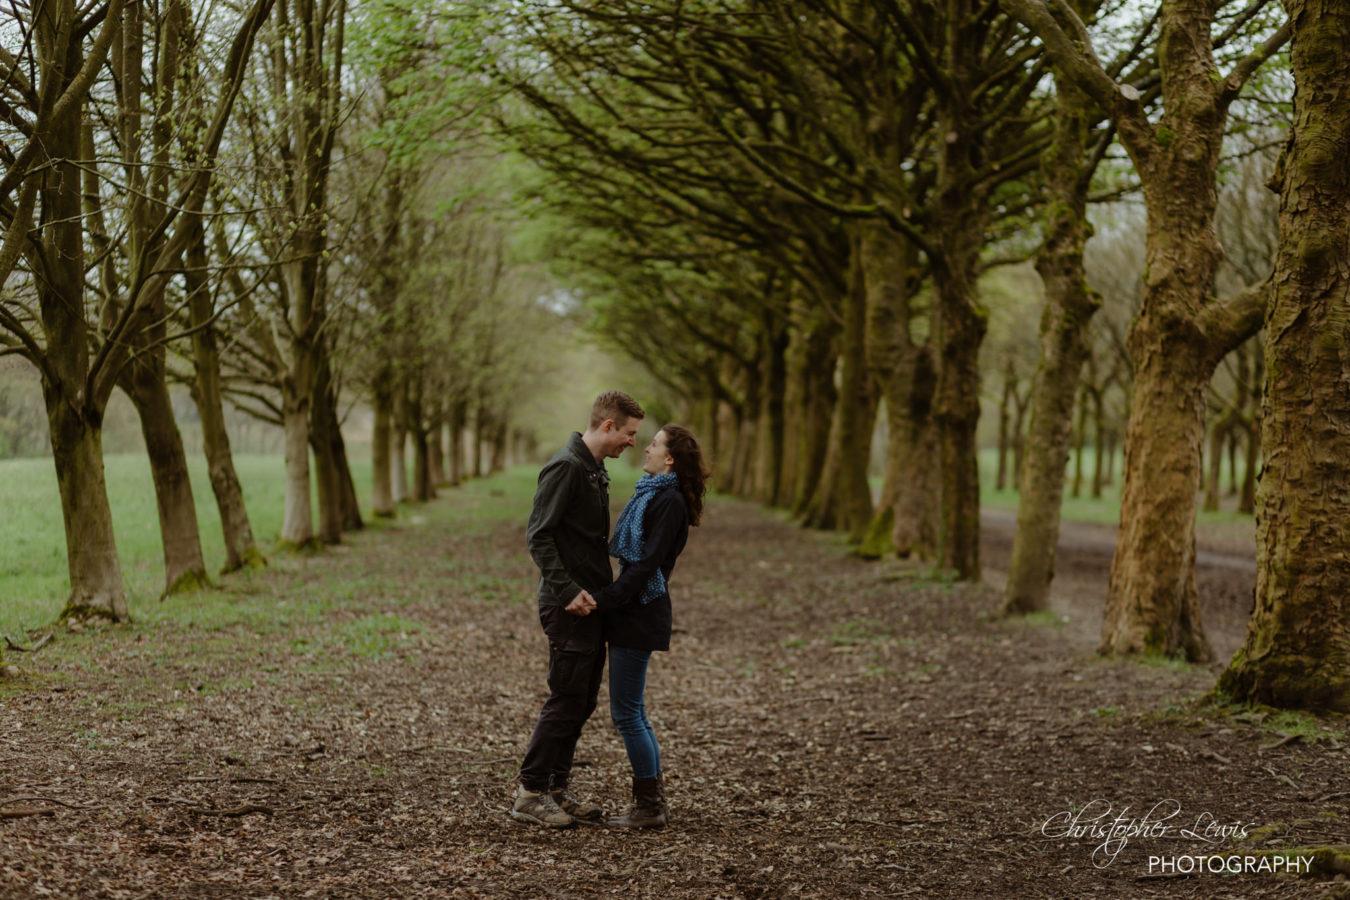 Colshaw-Hall-Pre-Wedding-Photo-15